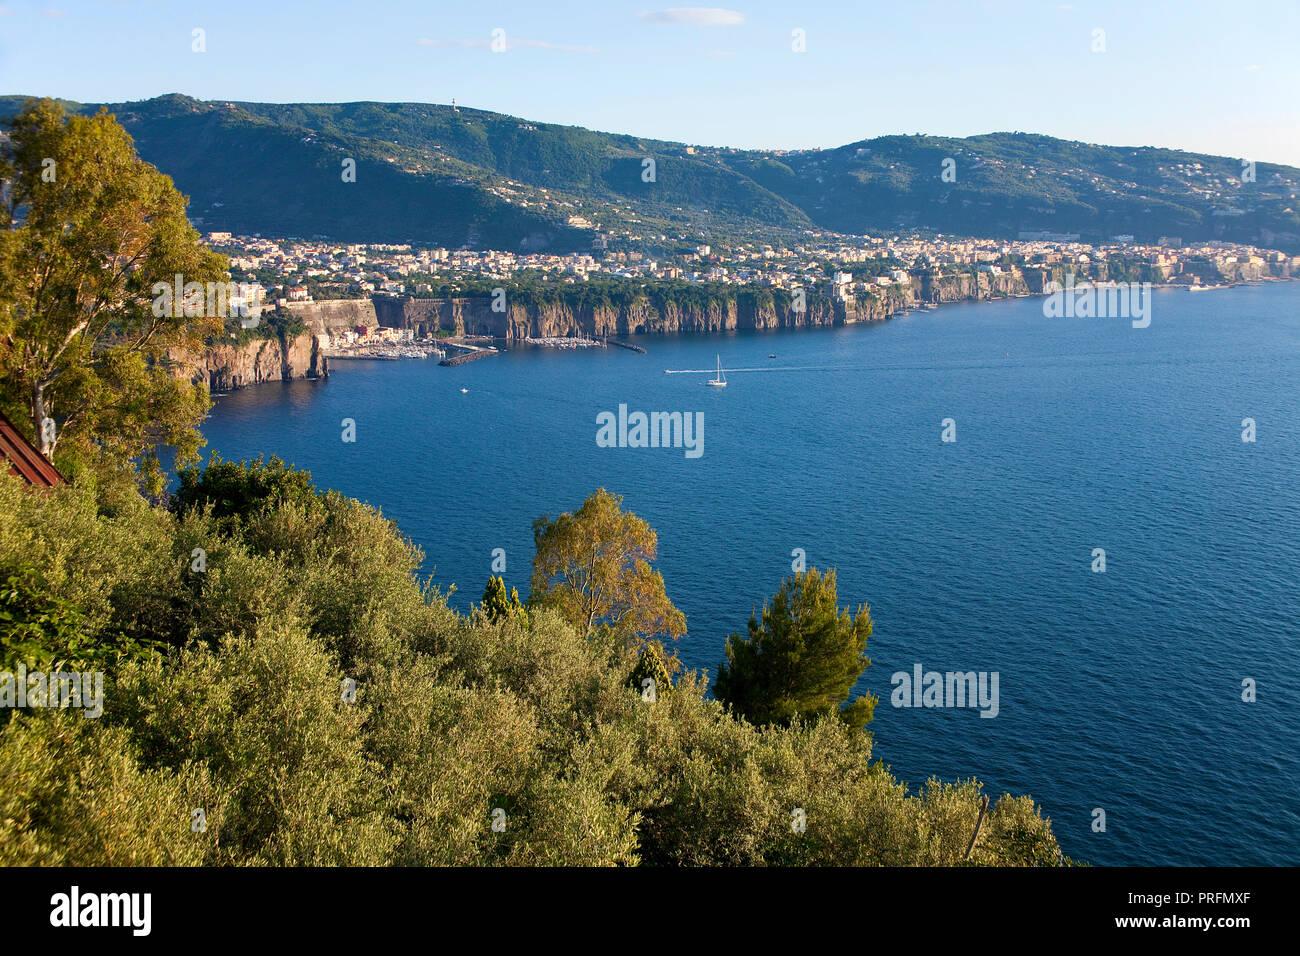 Peninsula of Sorrento, Gulf of Naples, Campania, Italy - Stock Image